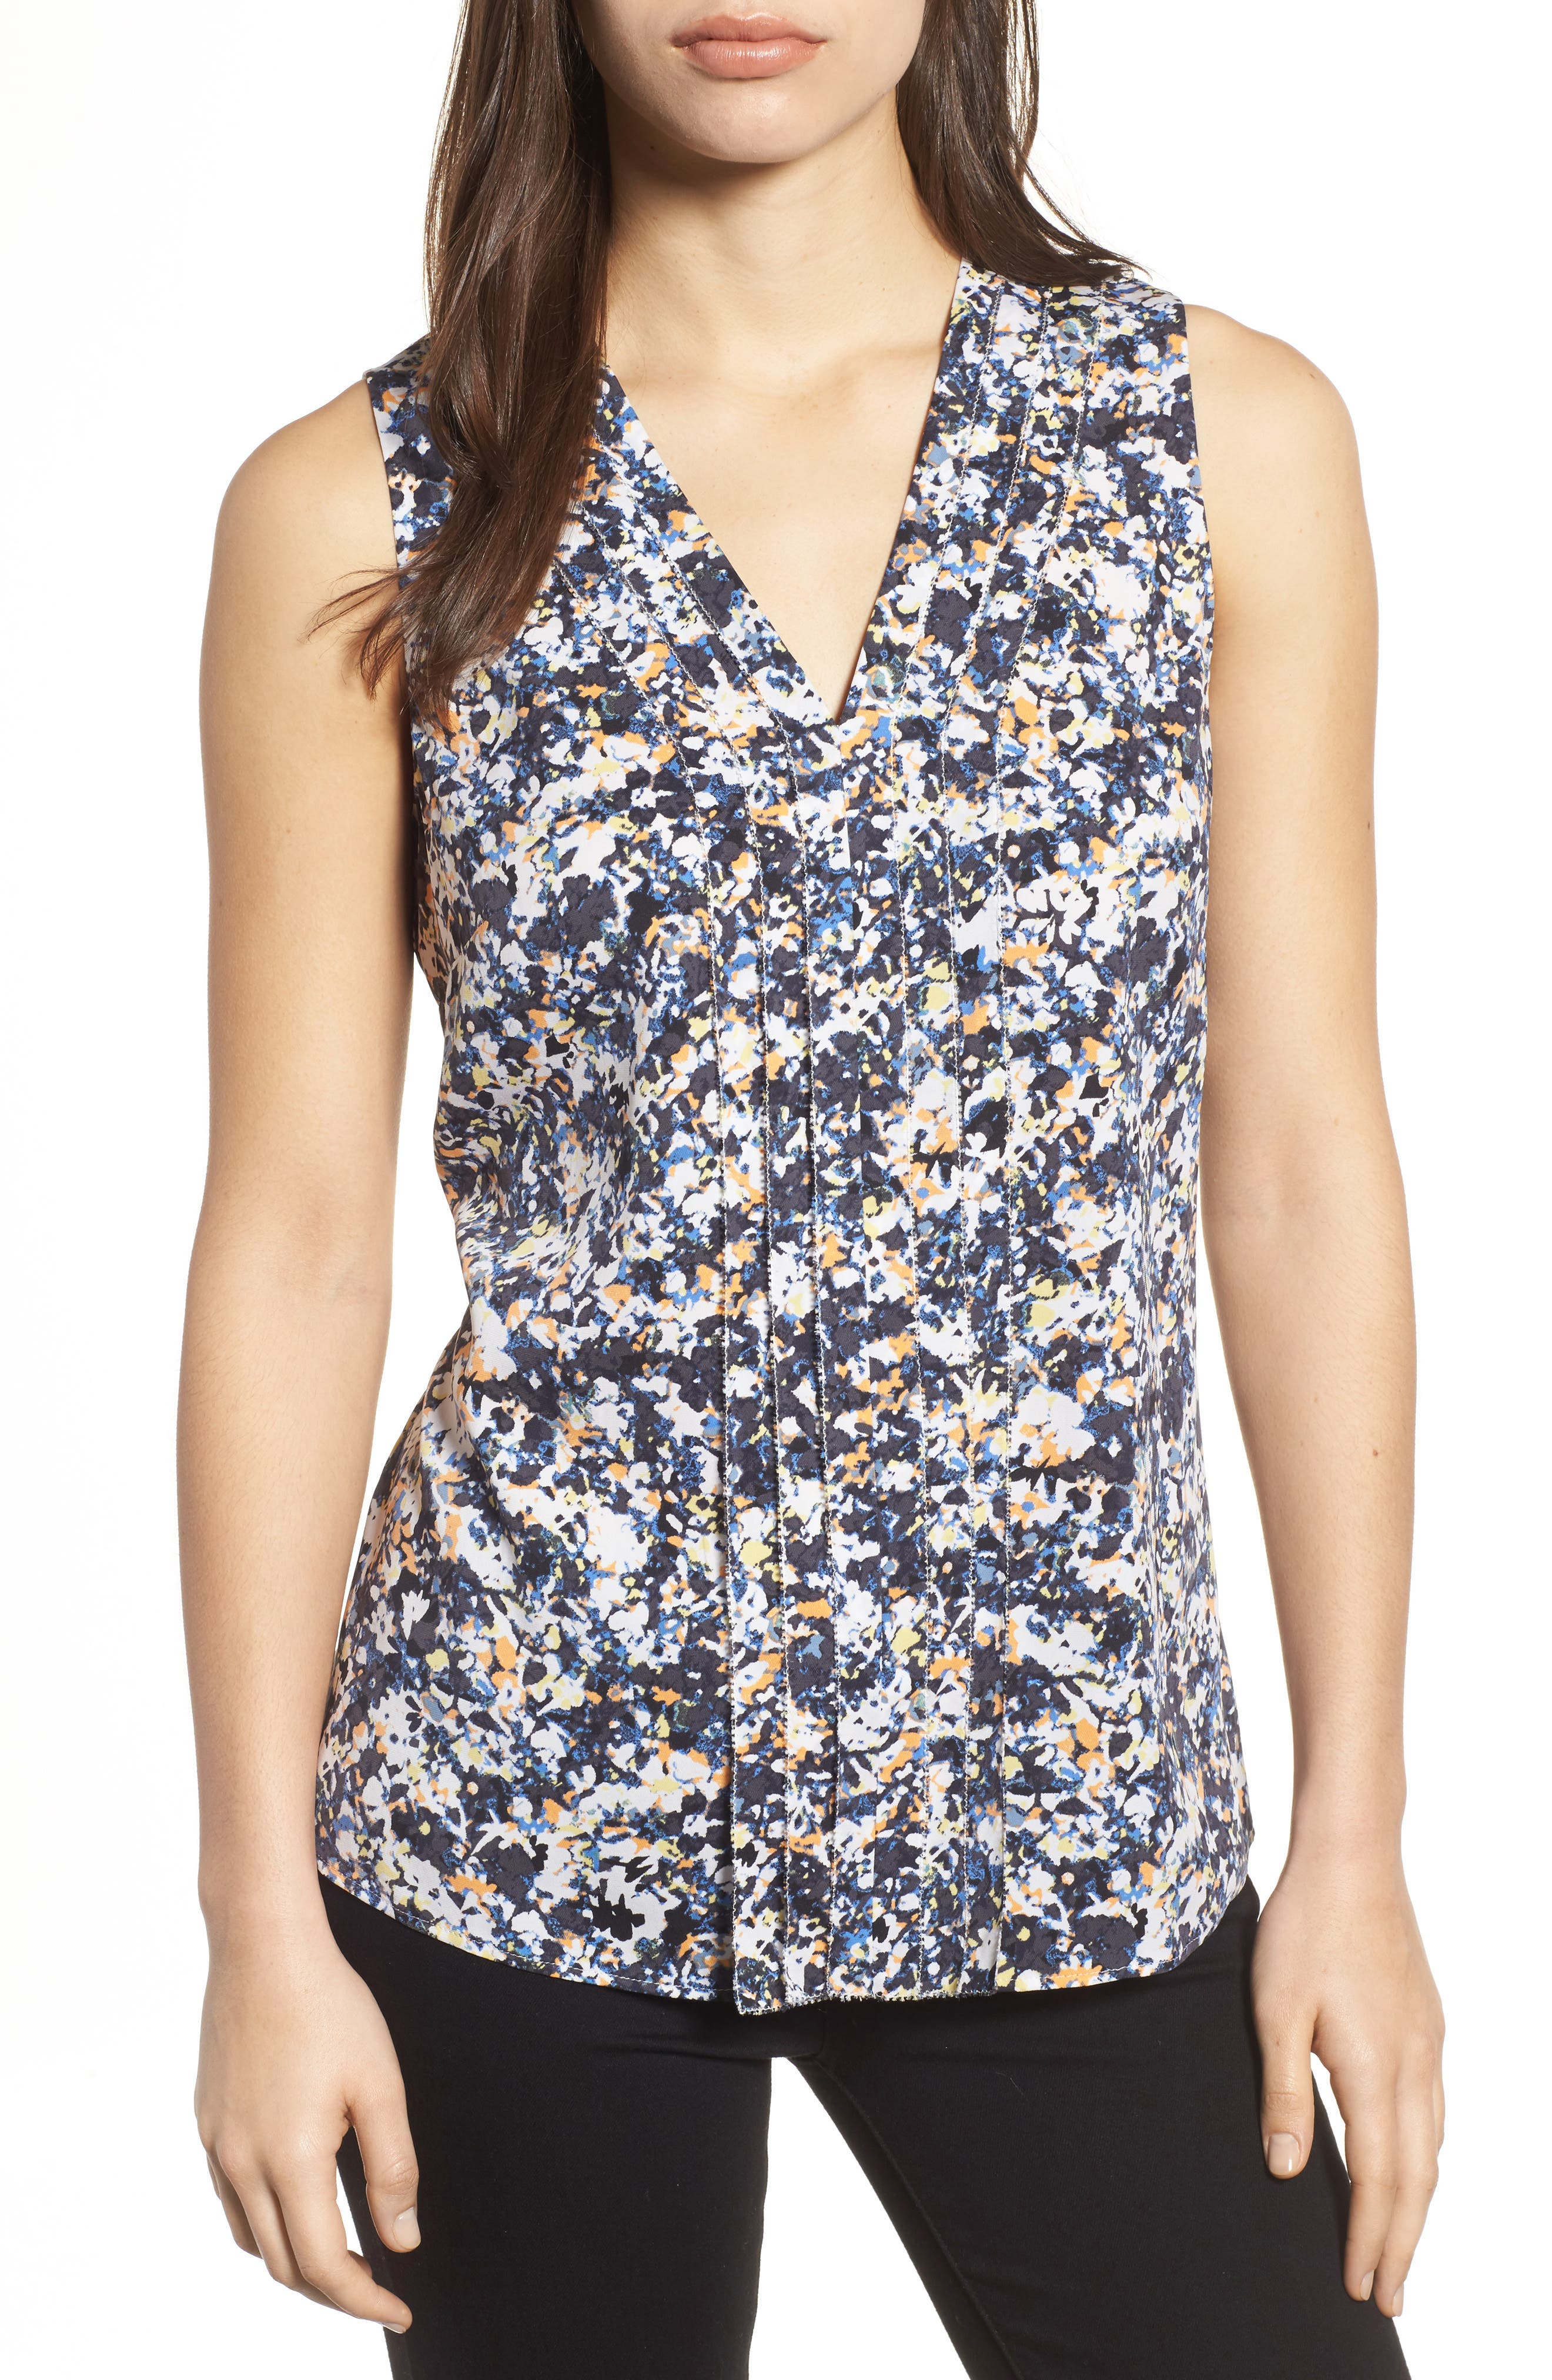 Picot Detail Silk Blend Blouse,                             Main thumbnail 1, color,                             Grey Multi Camo Floral